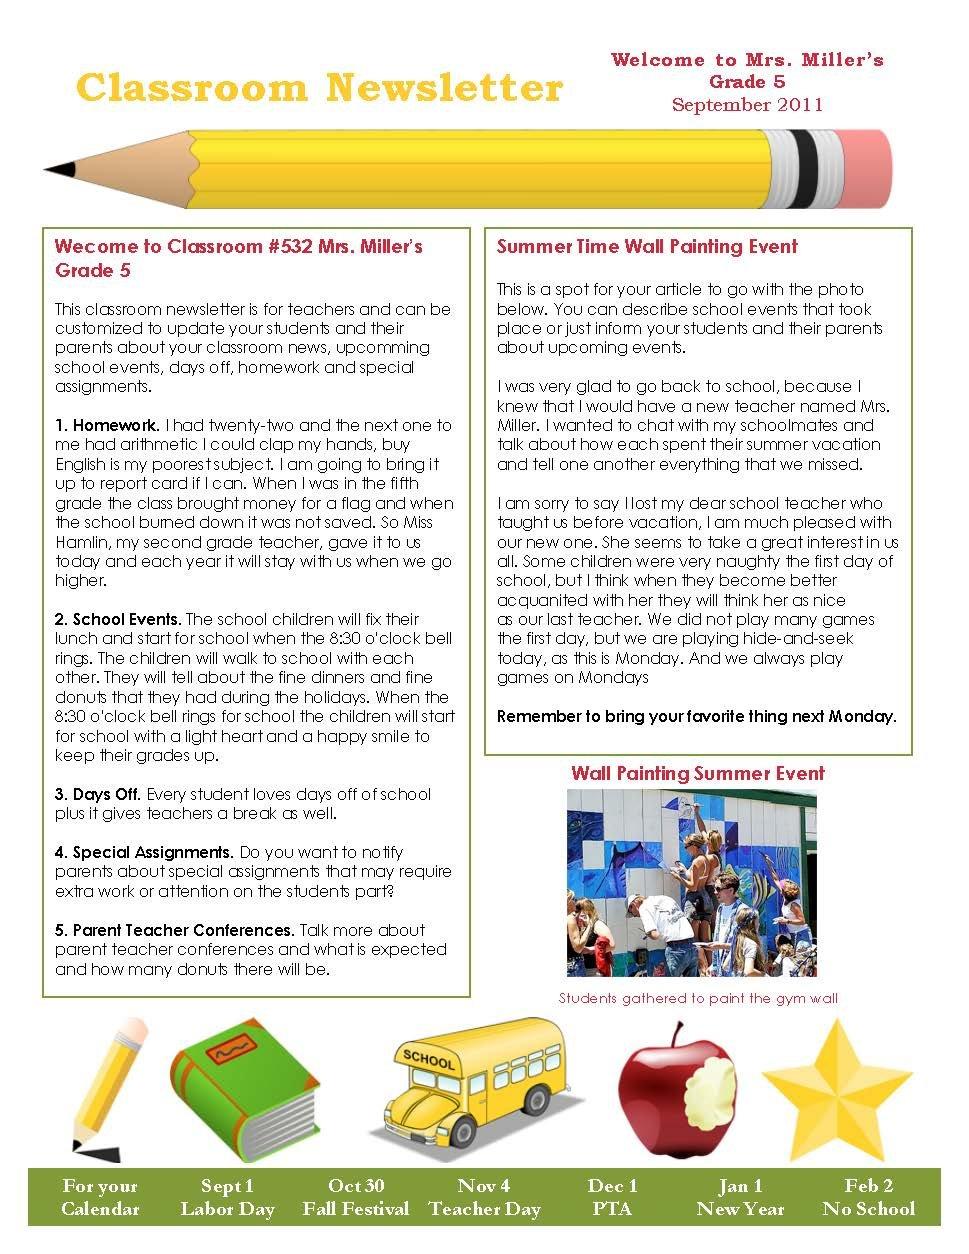 Classroom Newsletter Template - Pdf Format | E-Database E Newsletter Content Plan Template